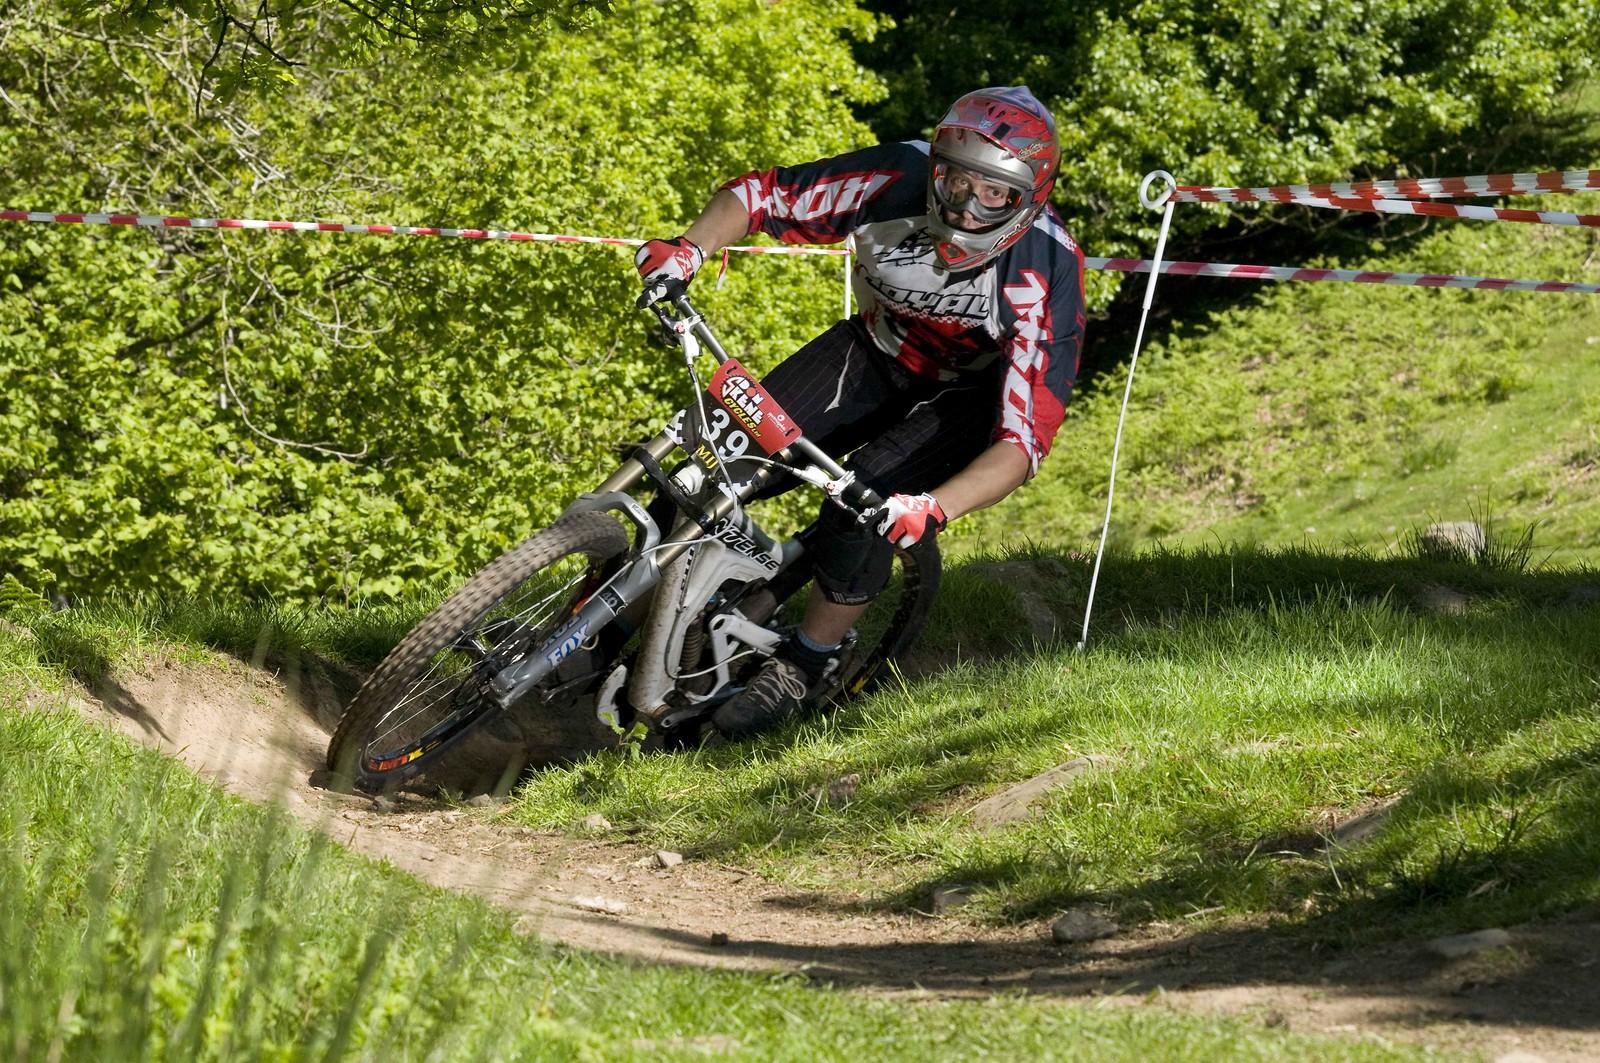 taff - jonashelford - Mountain Biking Pictures - Vital MTB